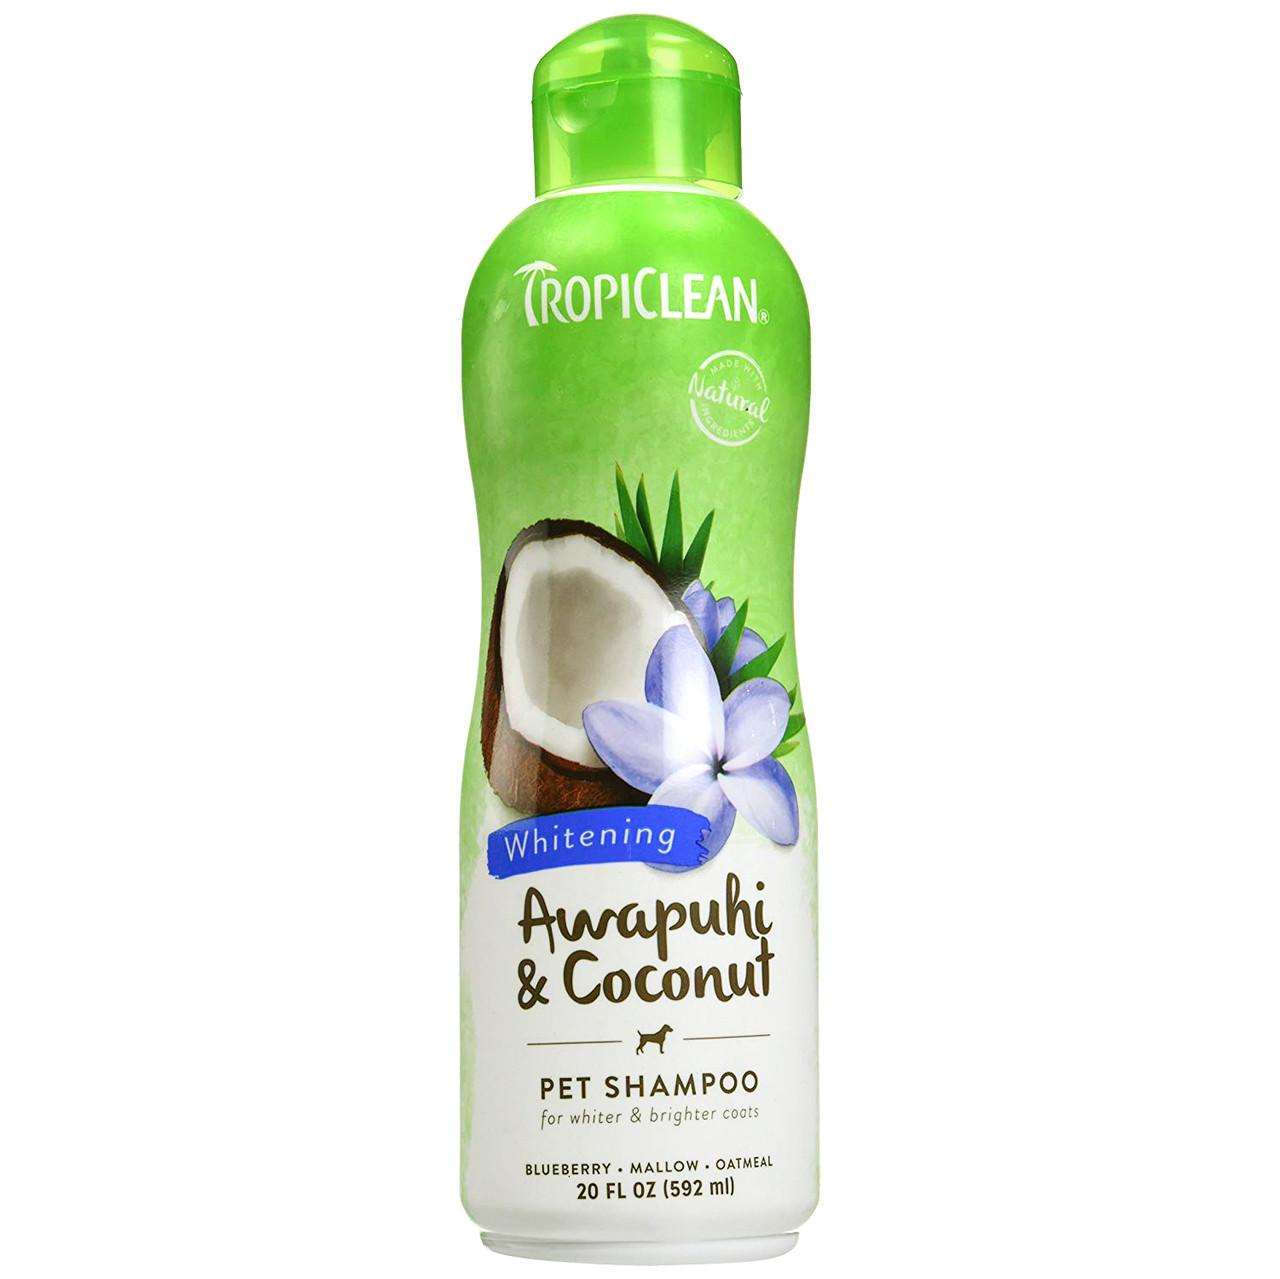 click here to shop TropiClean Awapuhi & Coconut Whitening Pet Shampoo